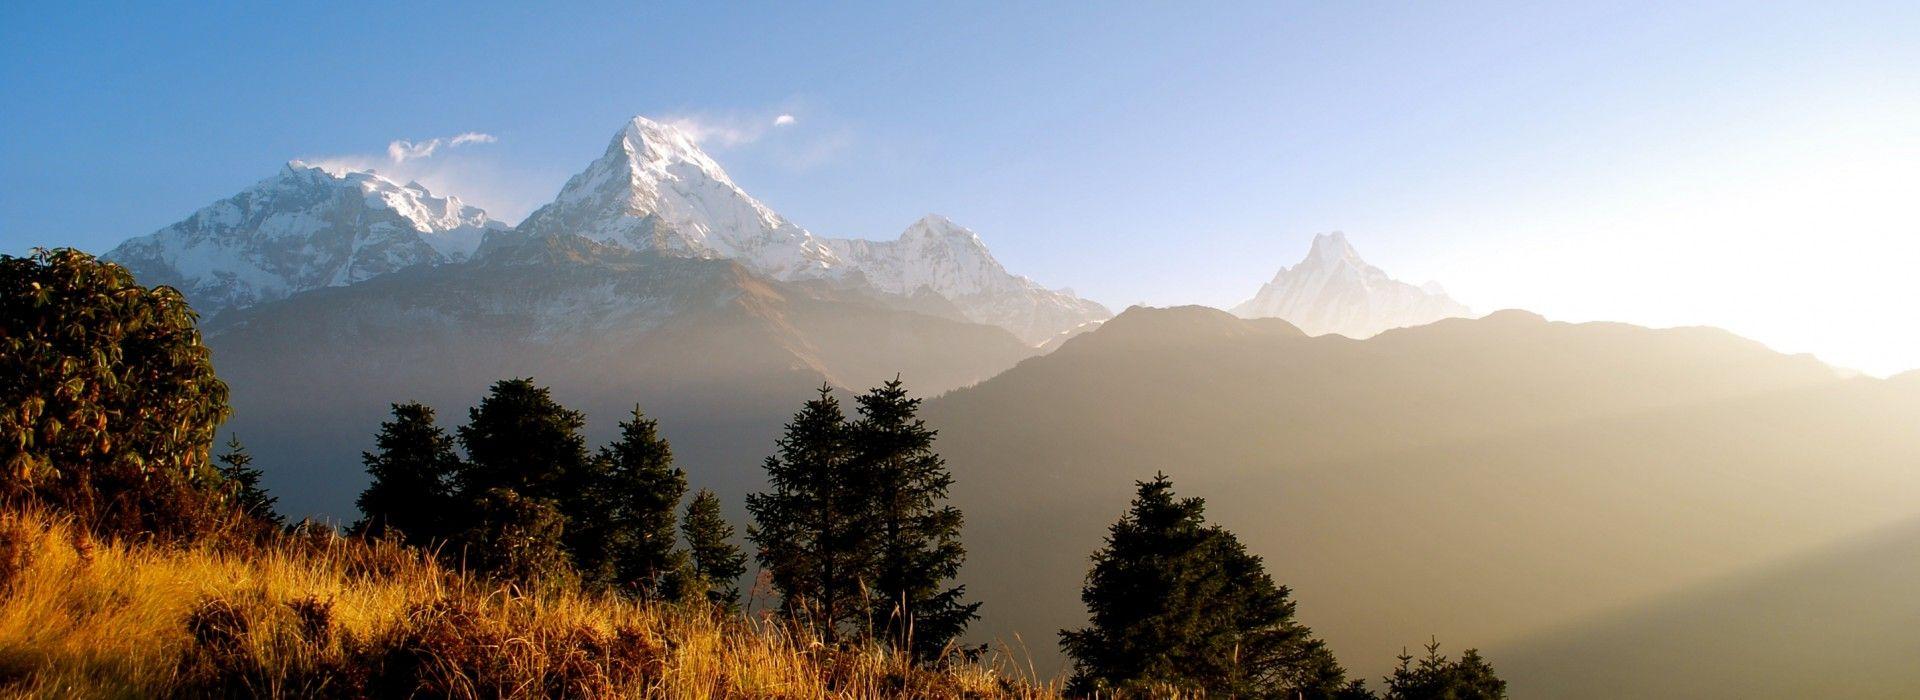 Trekking Tours in Mardi Himal Trek